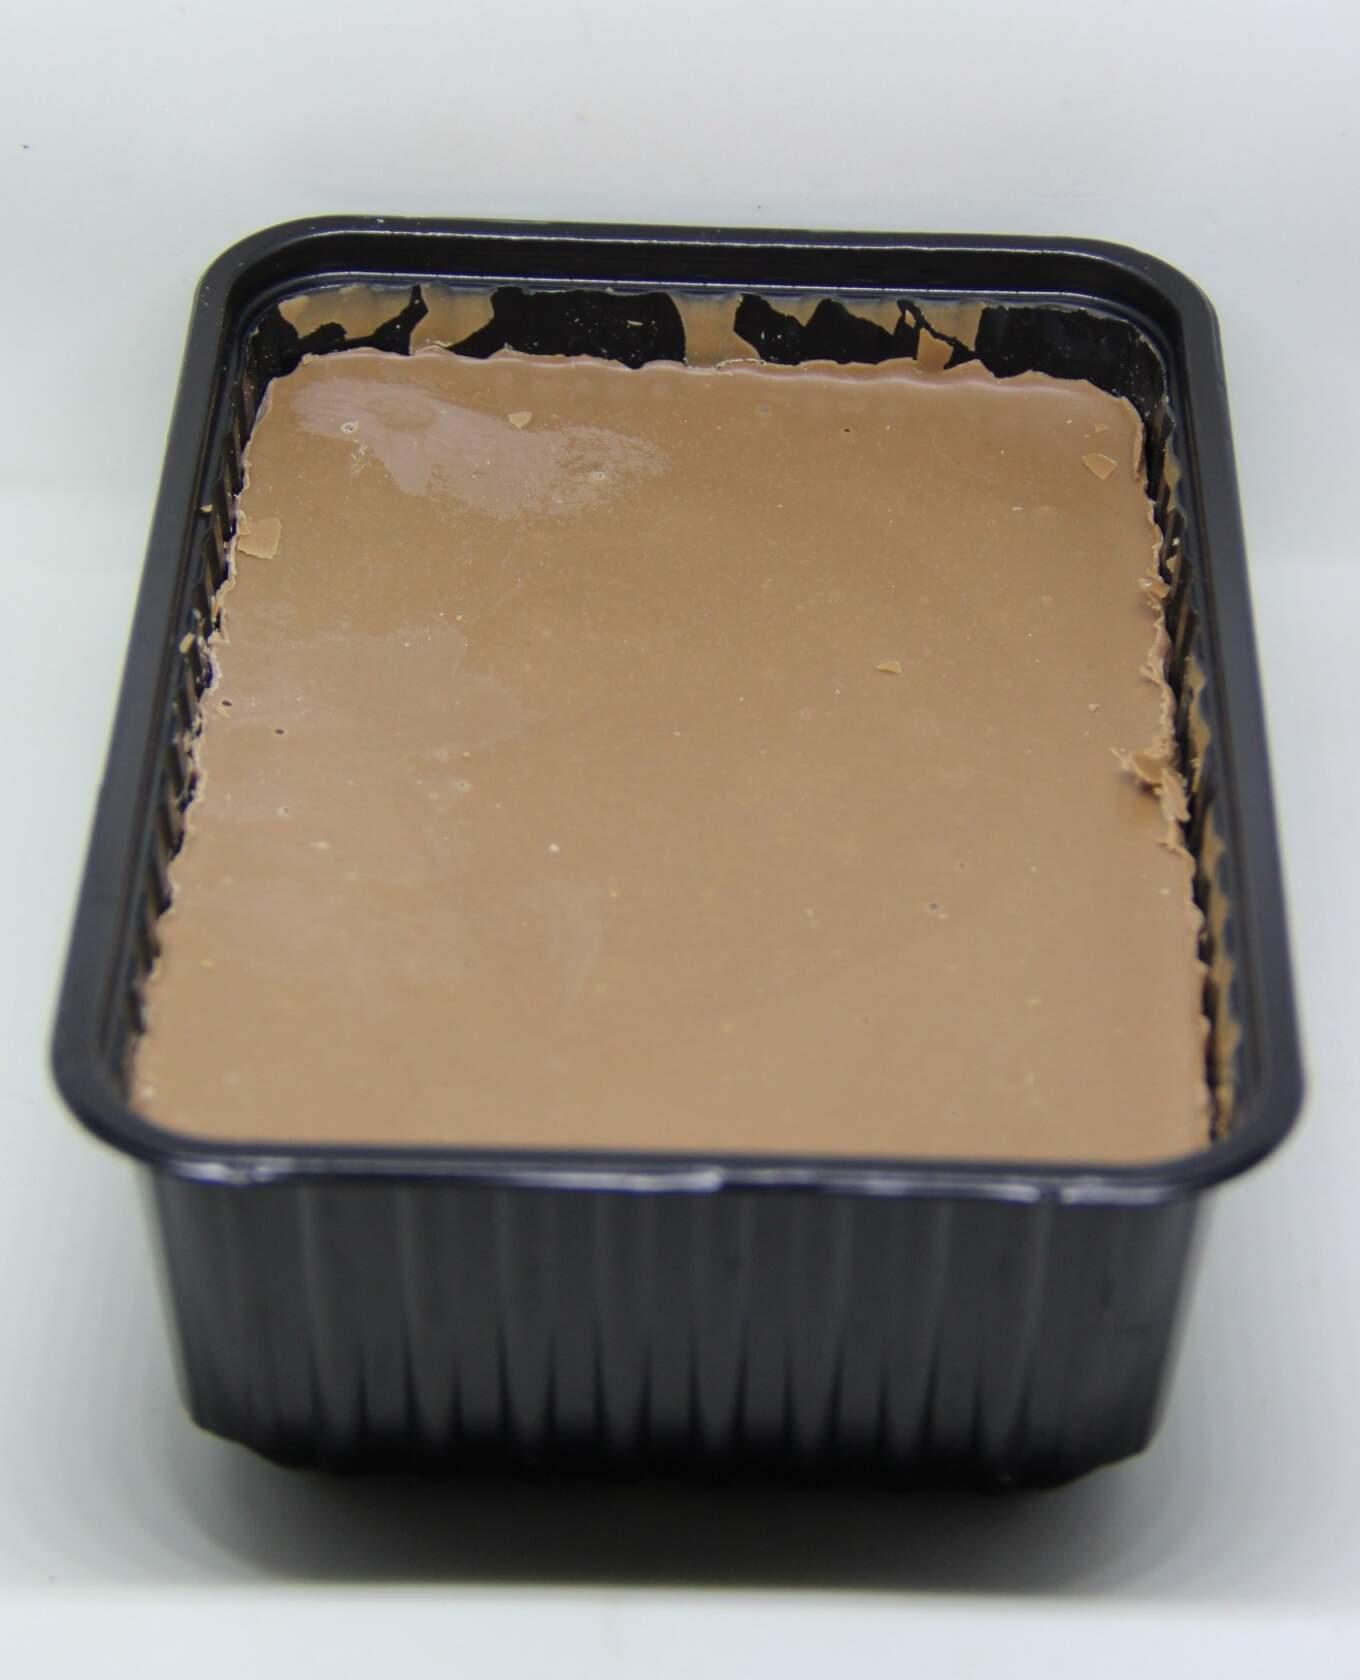 Молочный шоколад со вкусом крем-брюле 1 кг